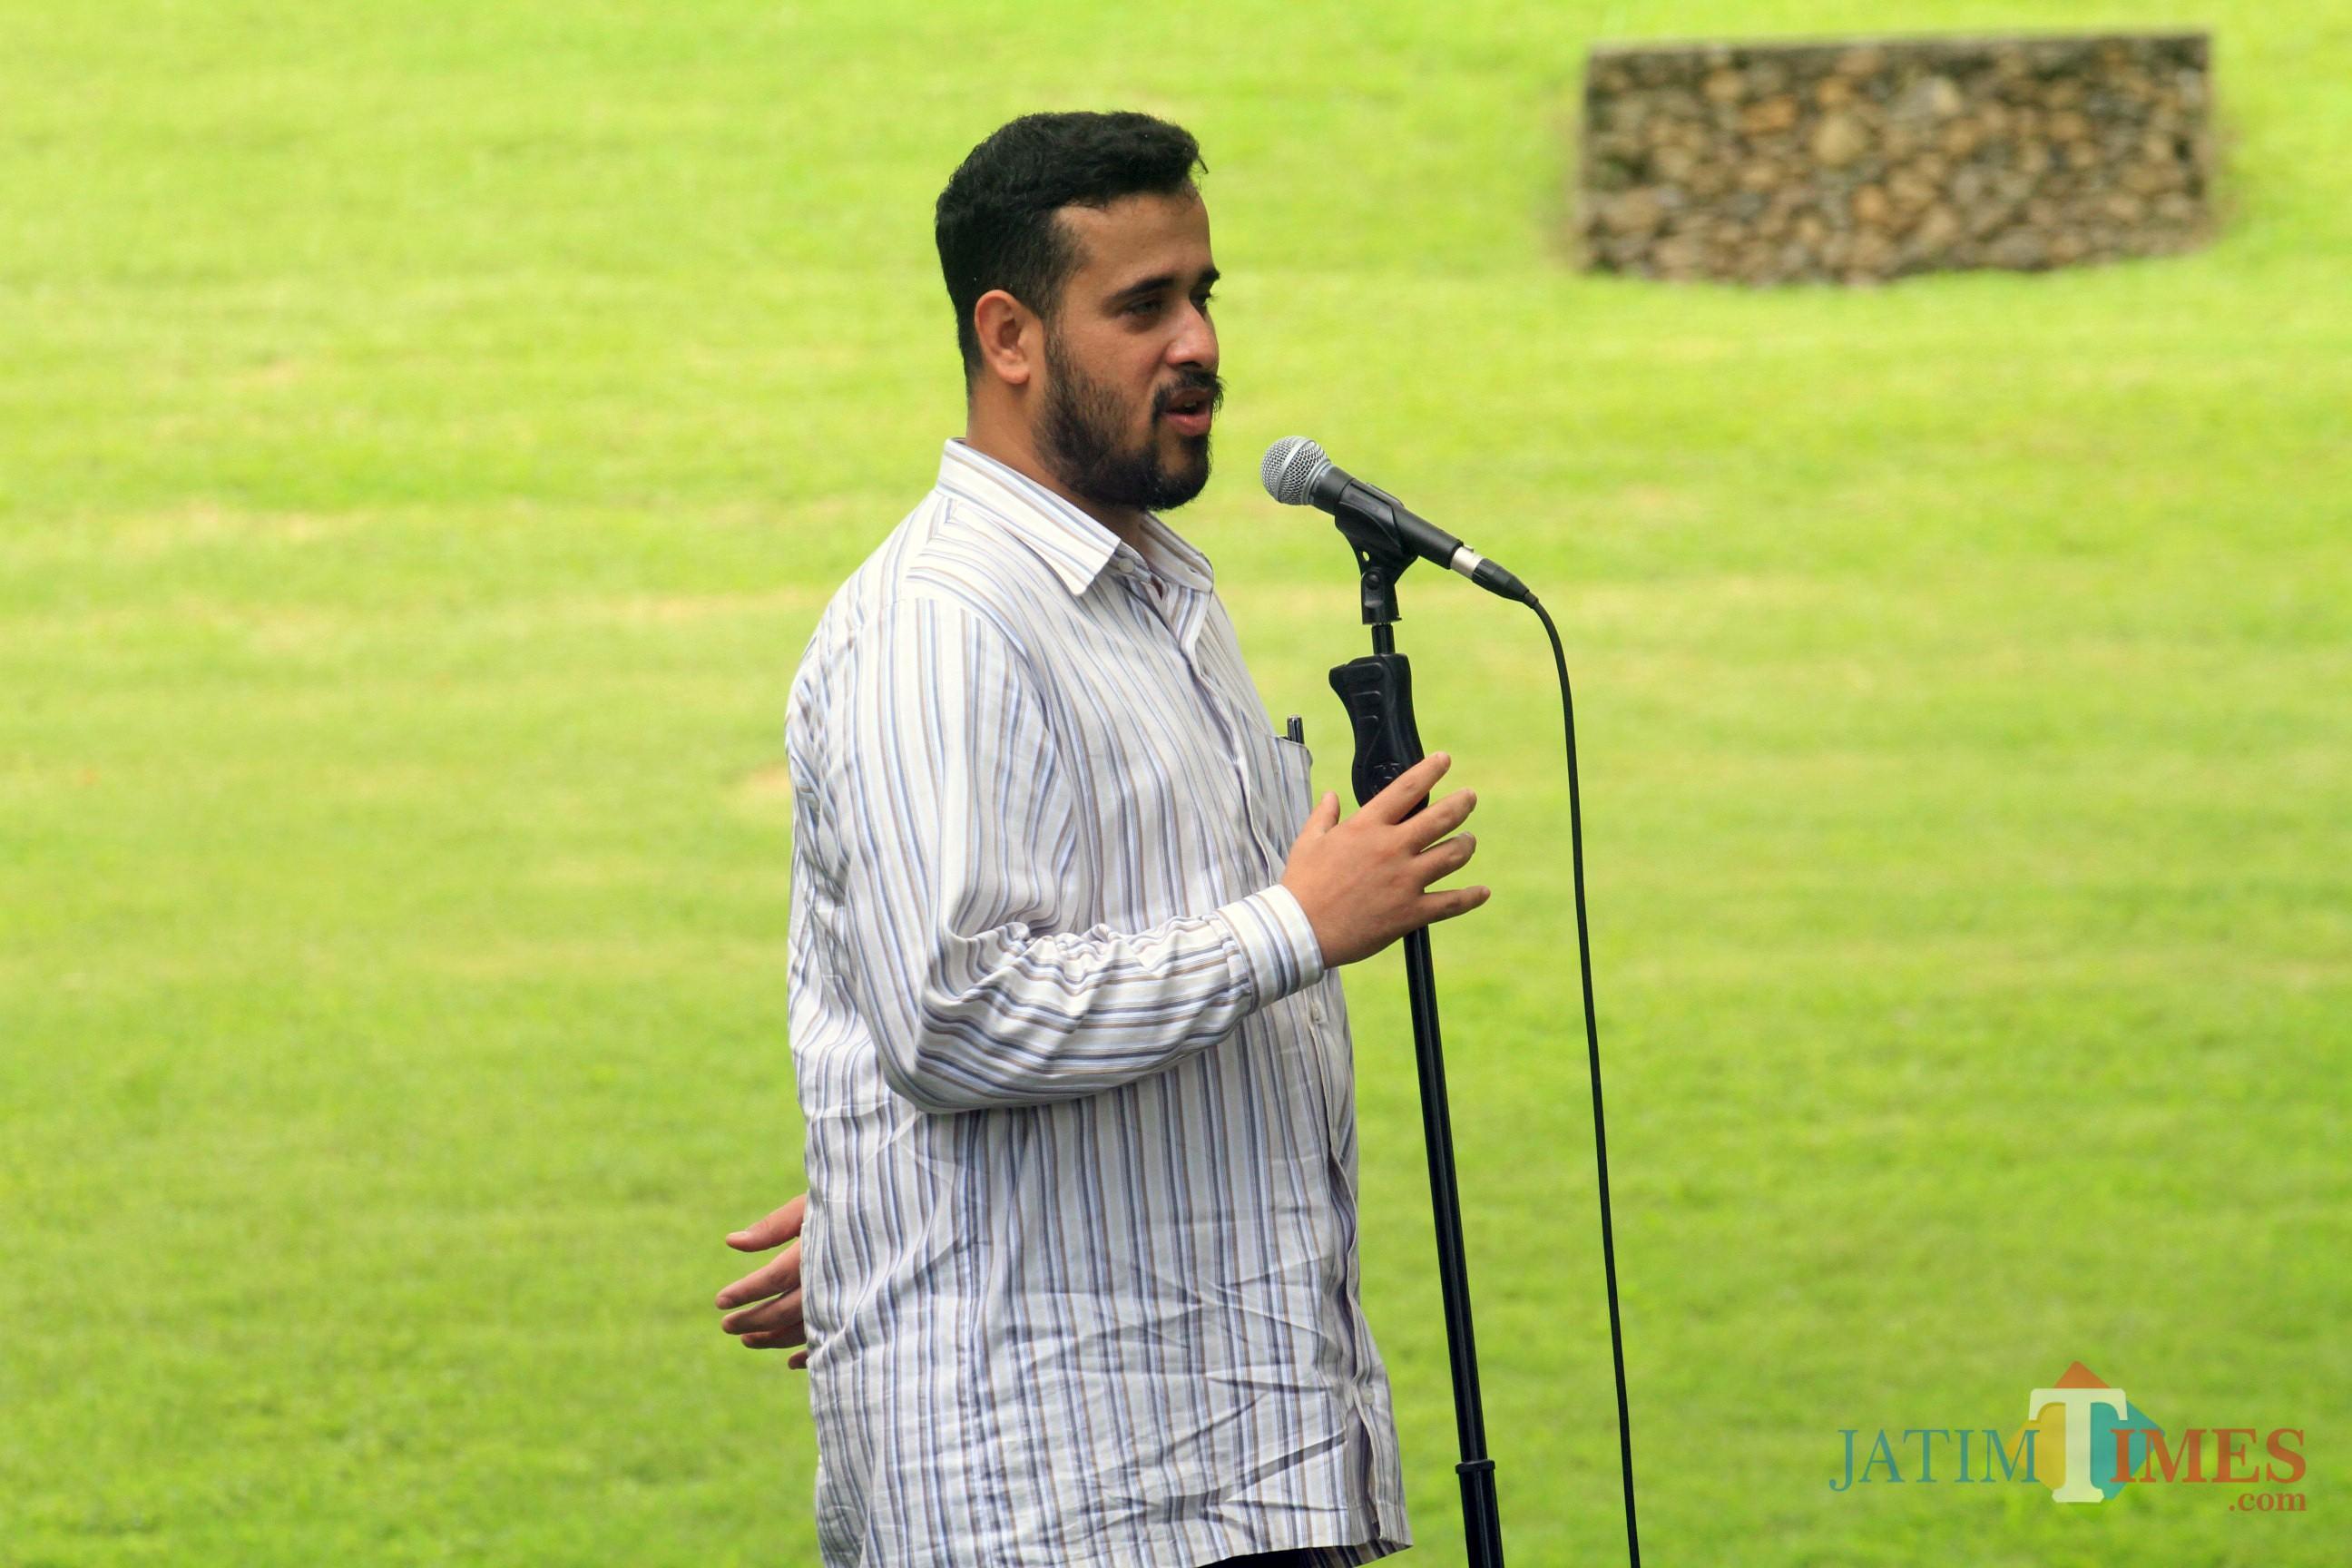 Wali kota Hadi Zainal Abidin dalam sebuah kesempatan (Agus Salam/Jatim TIMES)